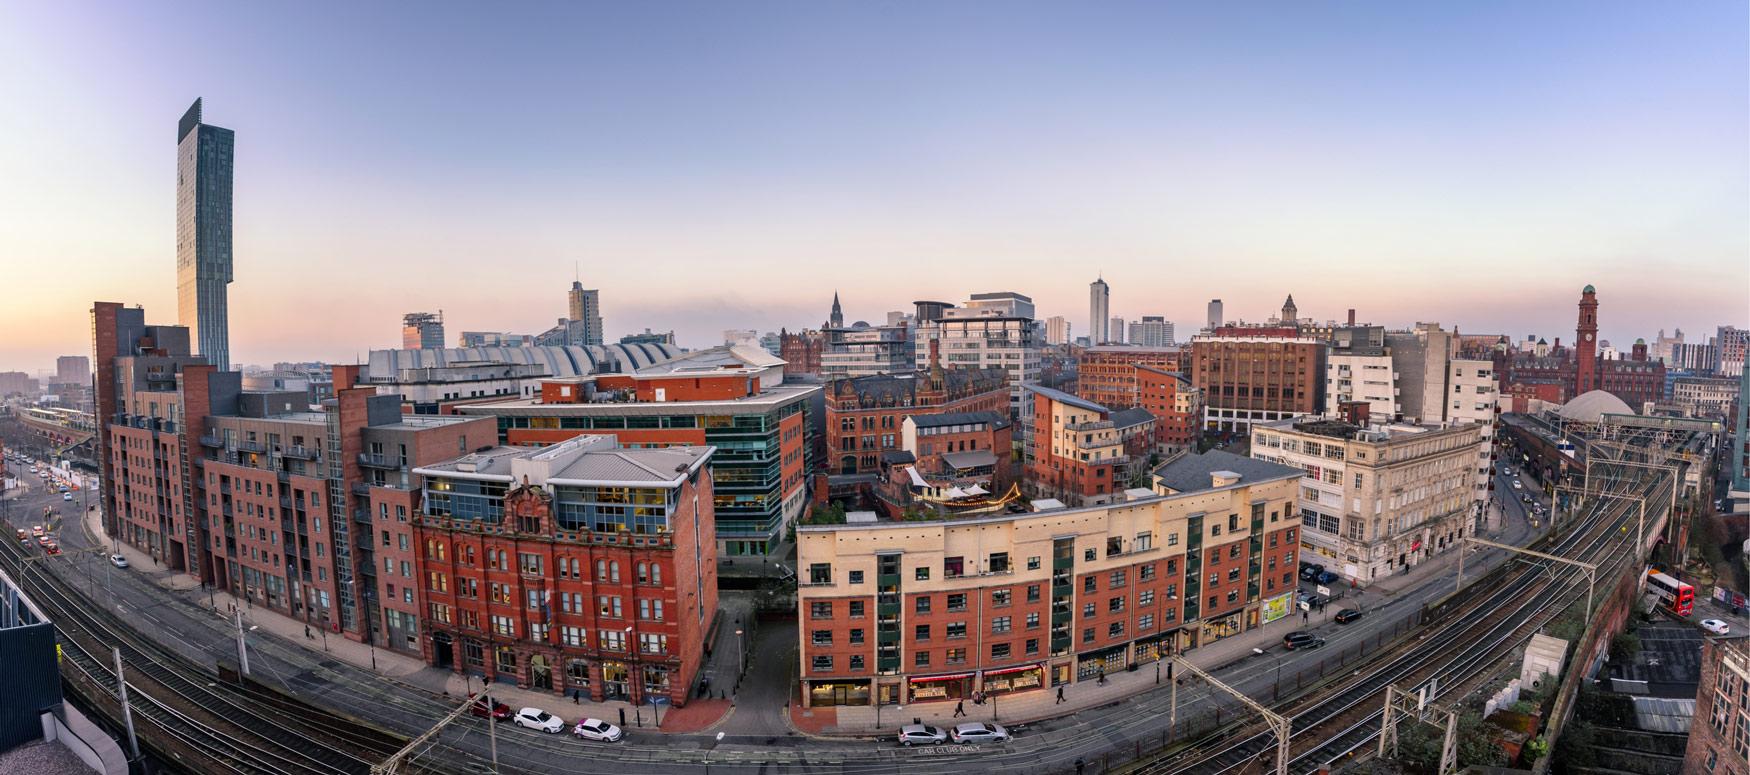 Manchester-ingiltere-dil-okulu-1.jpg